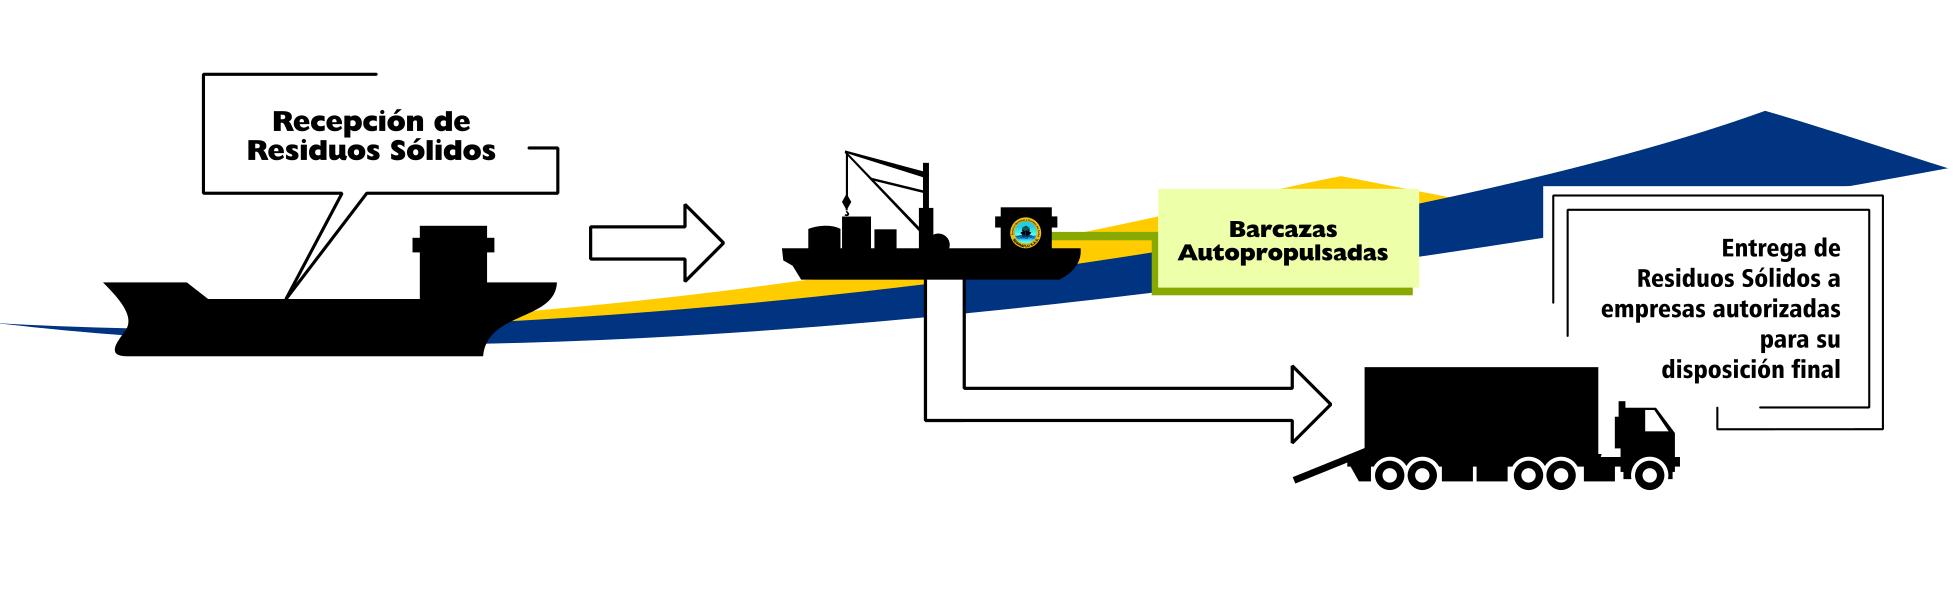 sermaflu servicio recolección residuos sólidos para buques